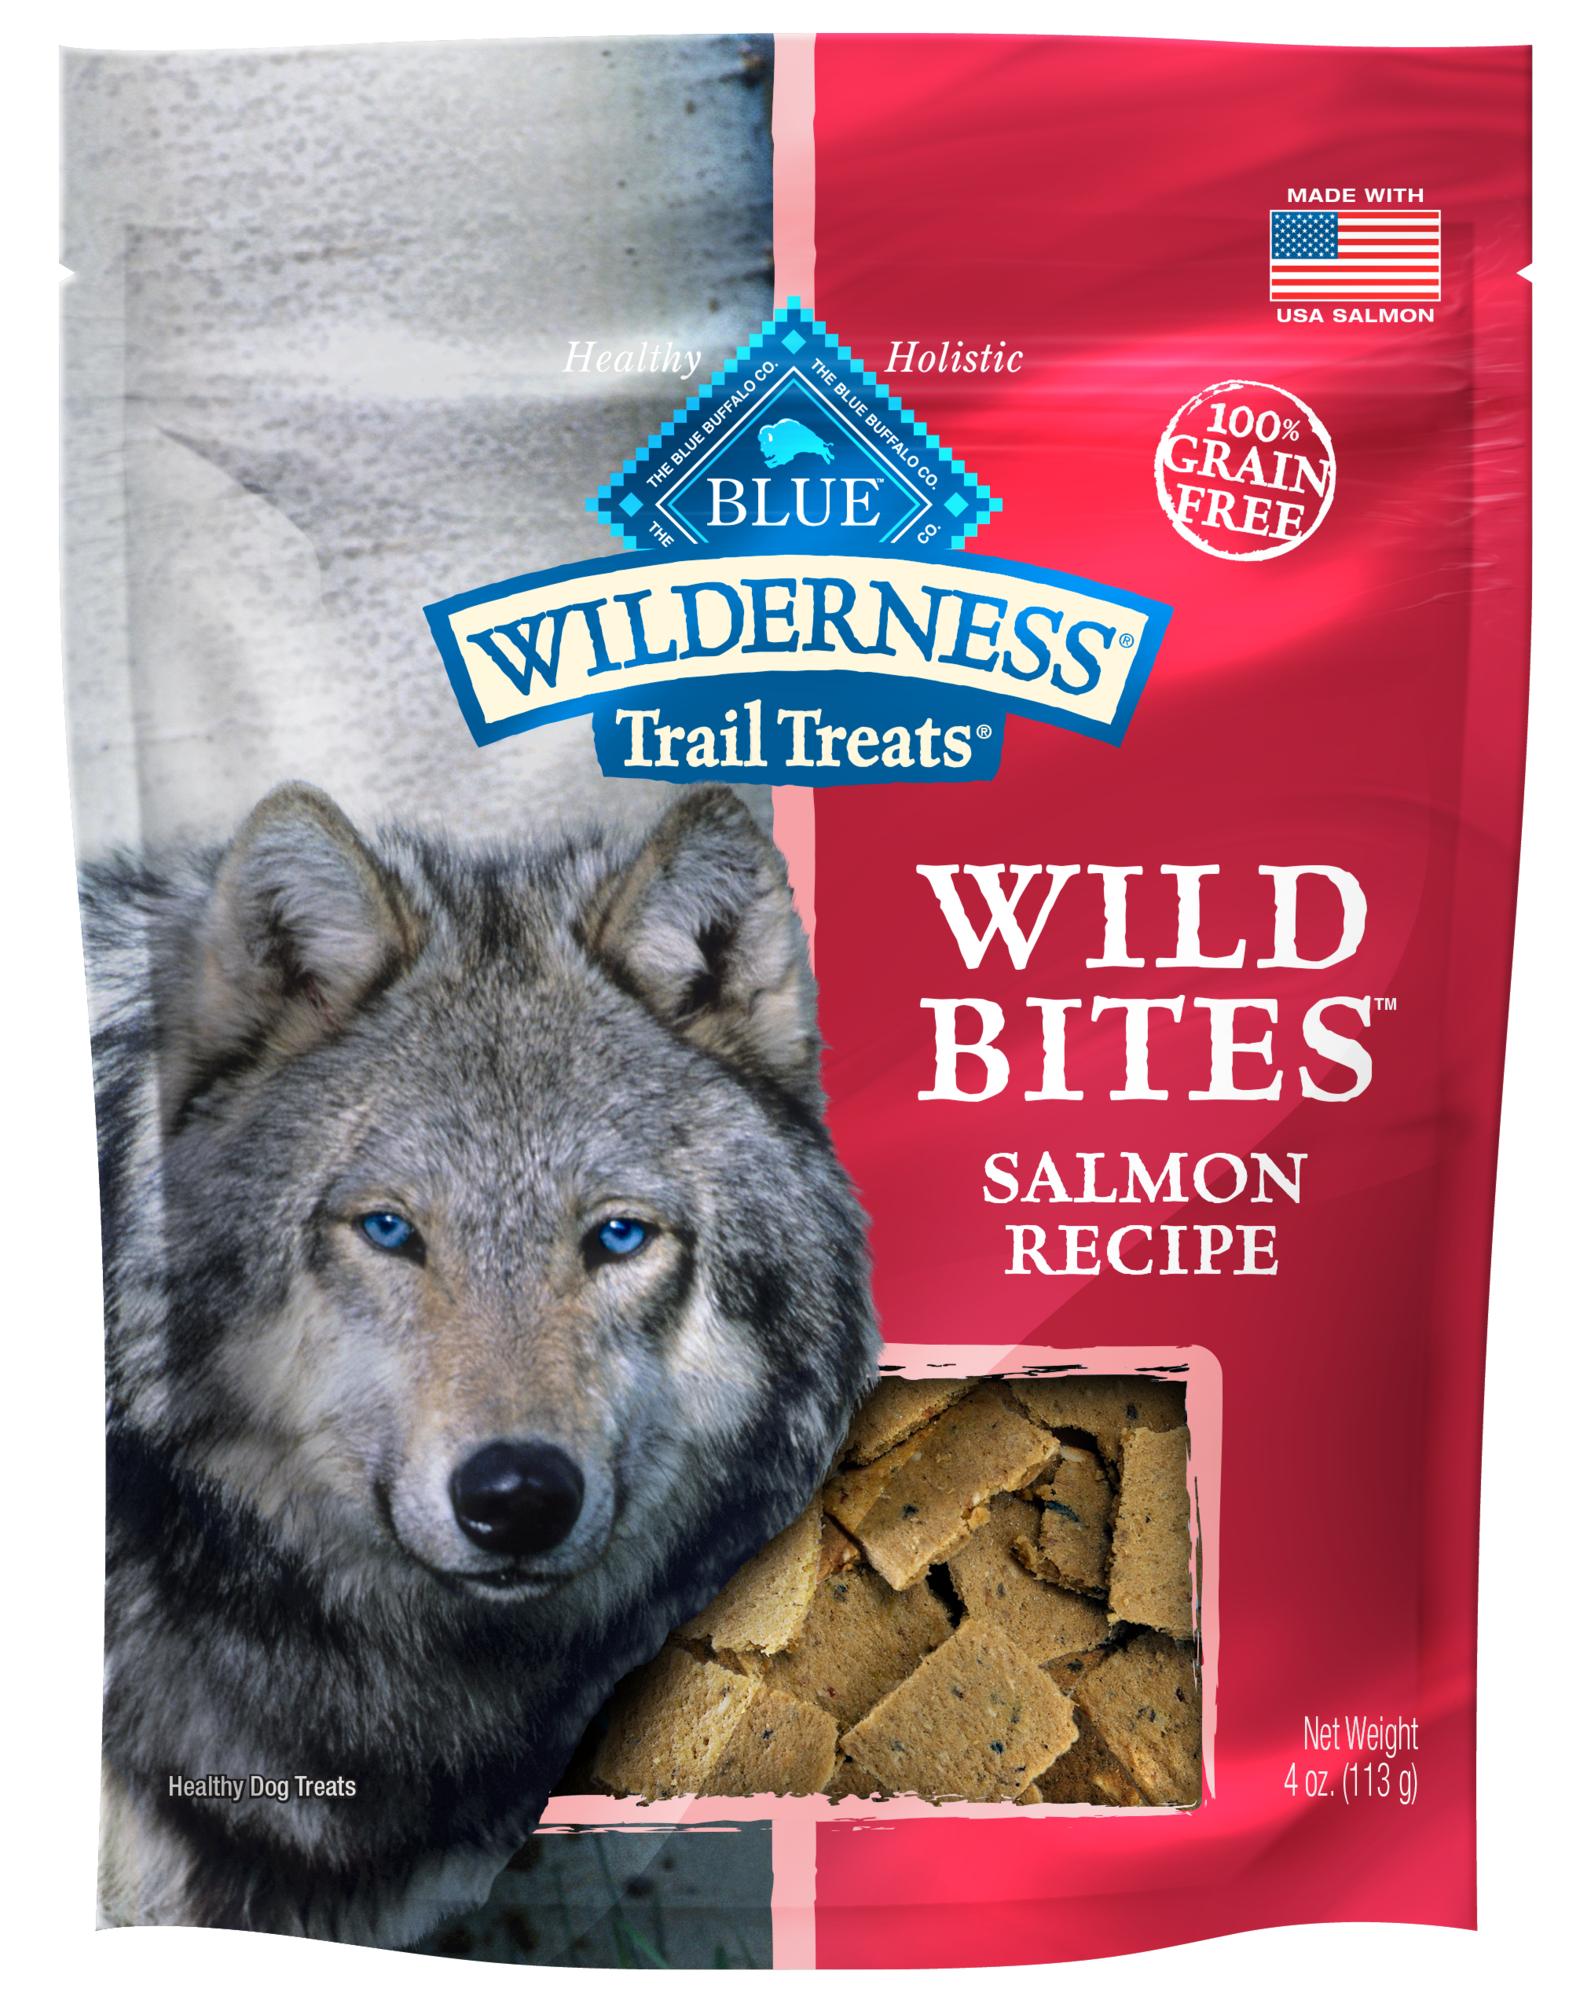 Blue Buffalo Wilderness Trail Treats Wild Bites Salmon Grain-Free Dog Treats, 4-oz bag $2.33